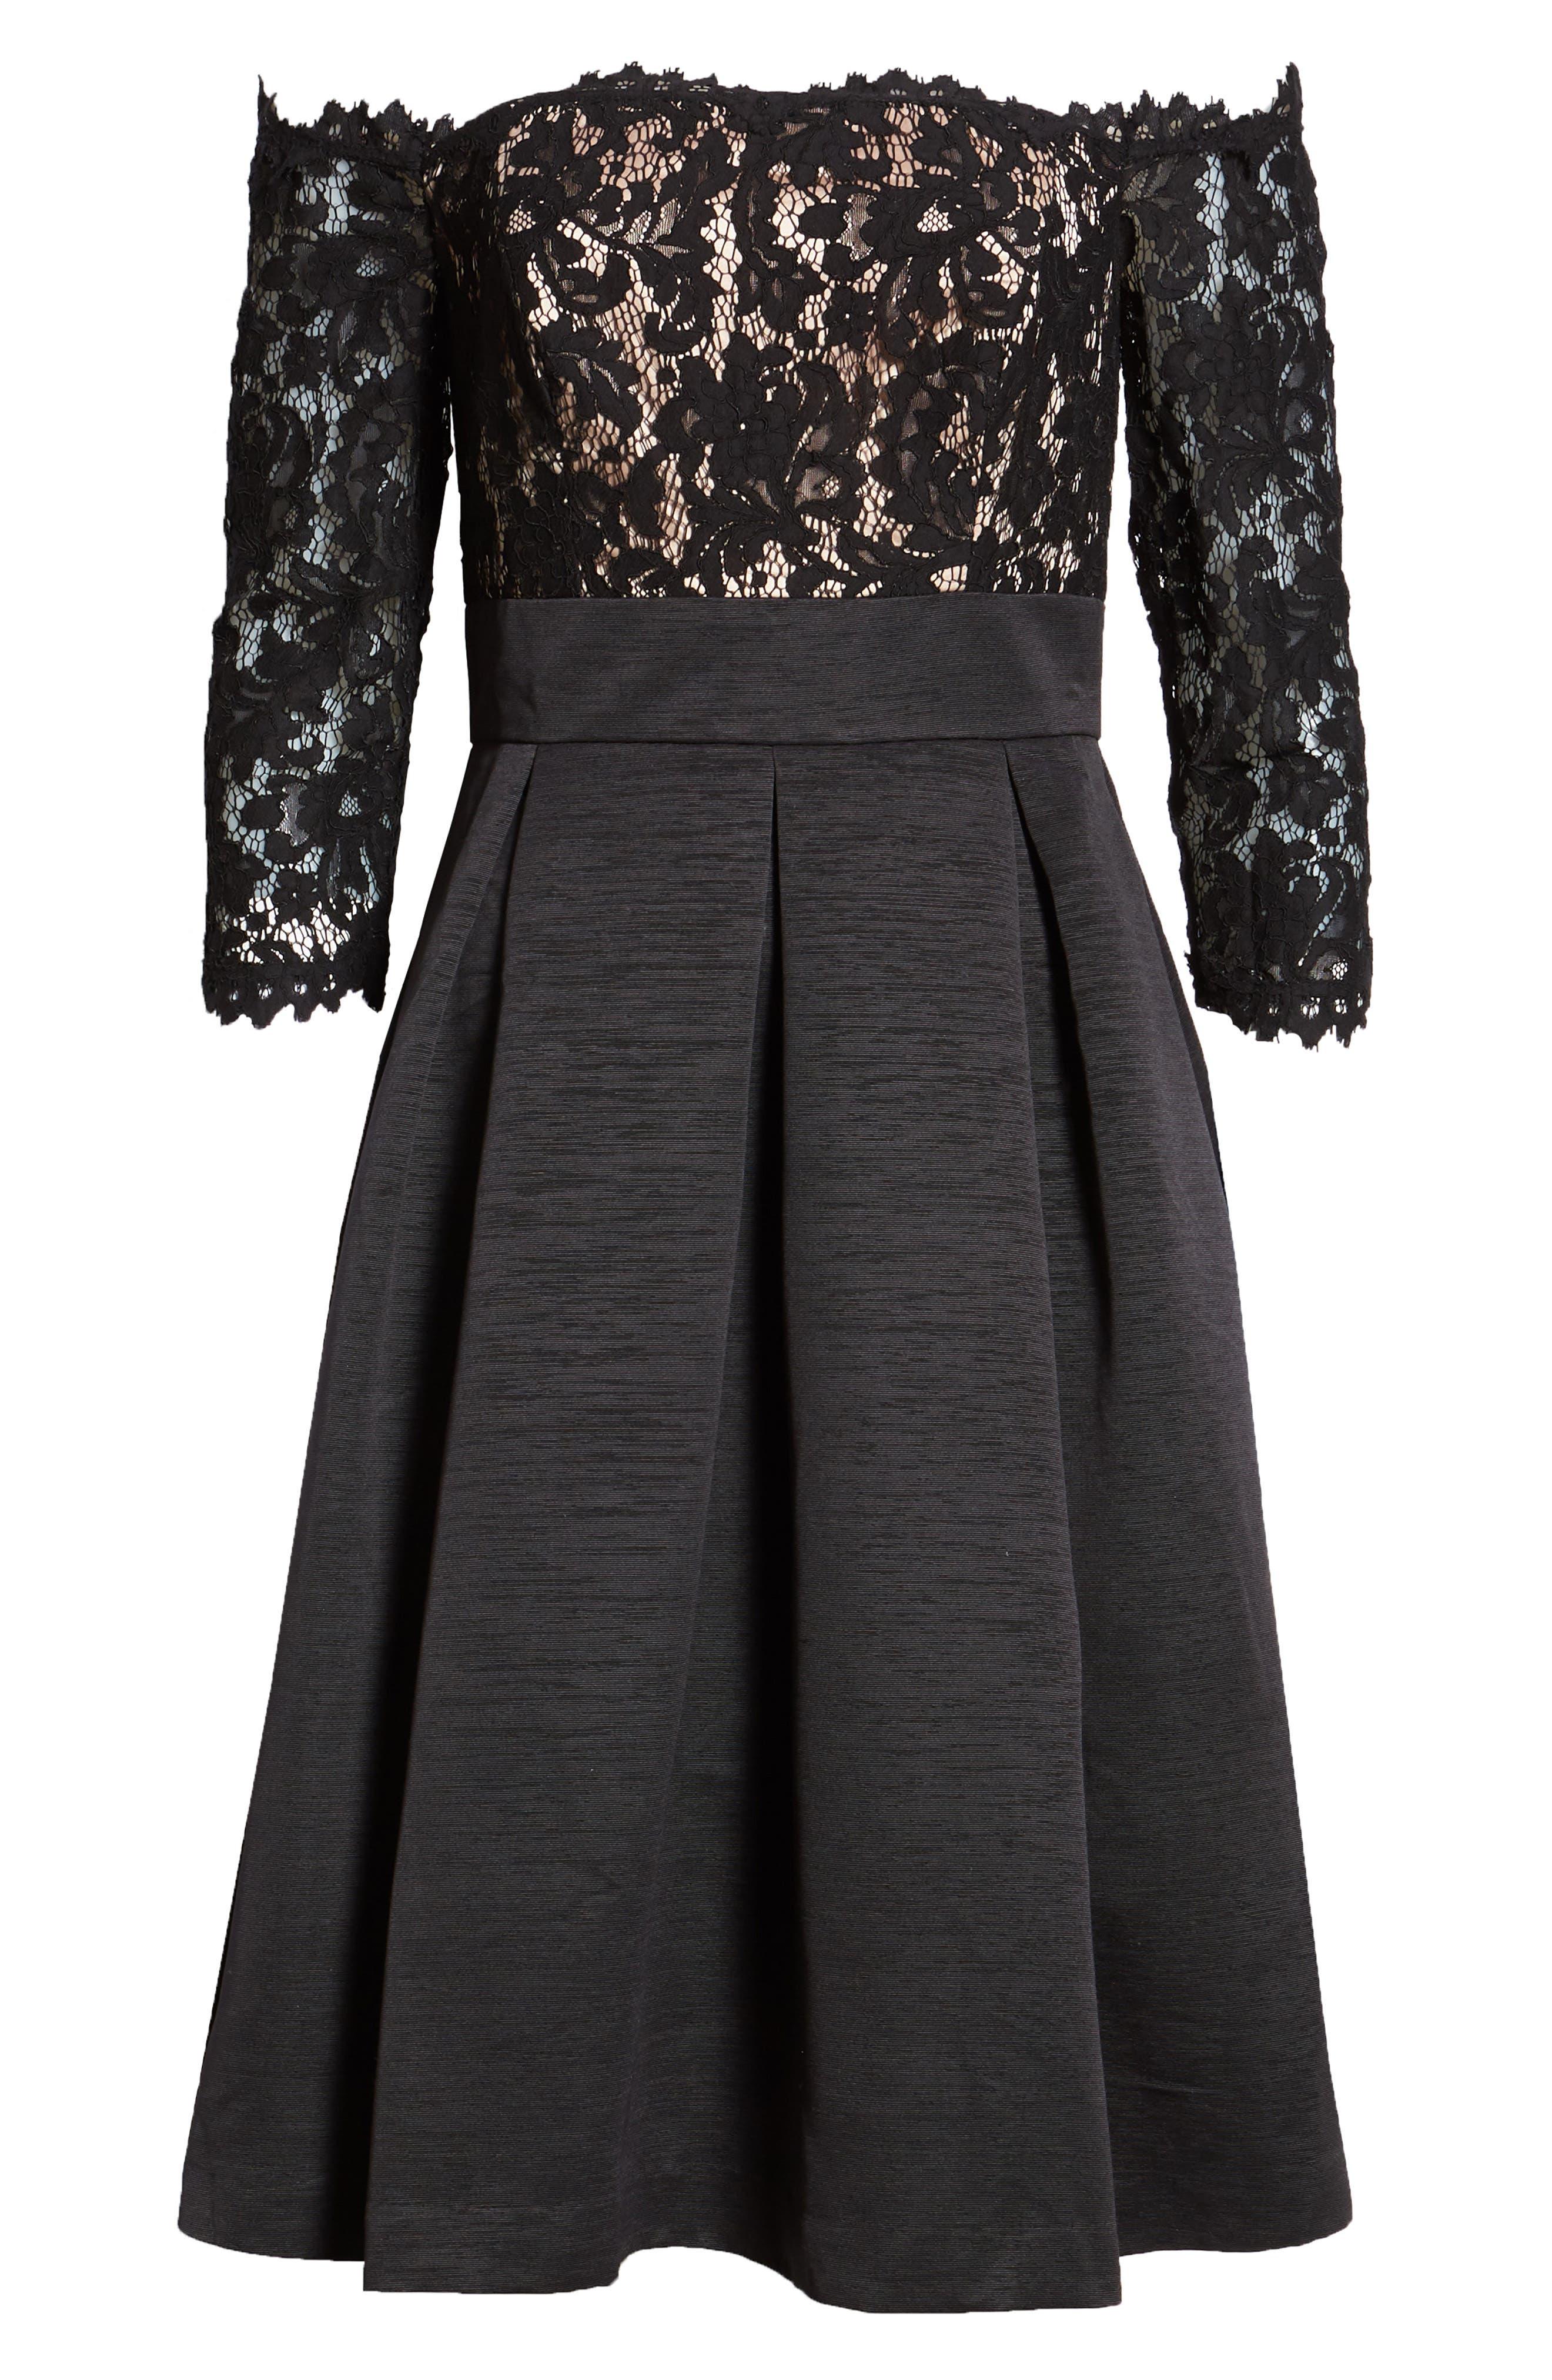 Off the Shoulder A-Line Dress,                             Alternate thumbnail 8, color,                             BLACK